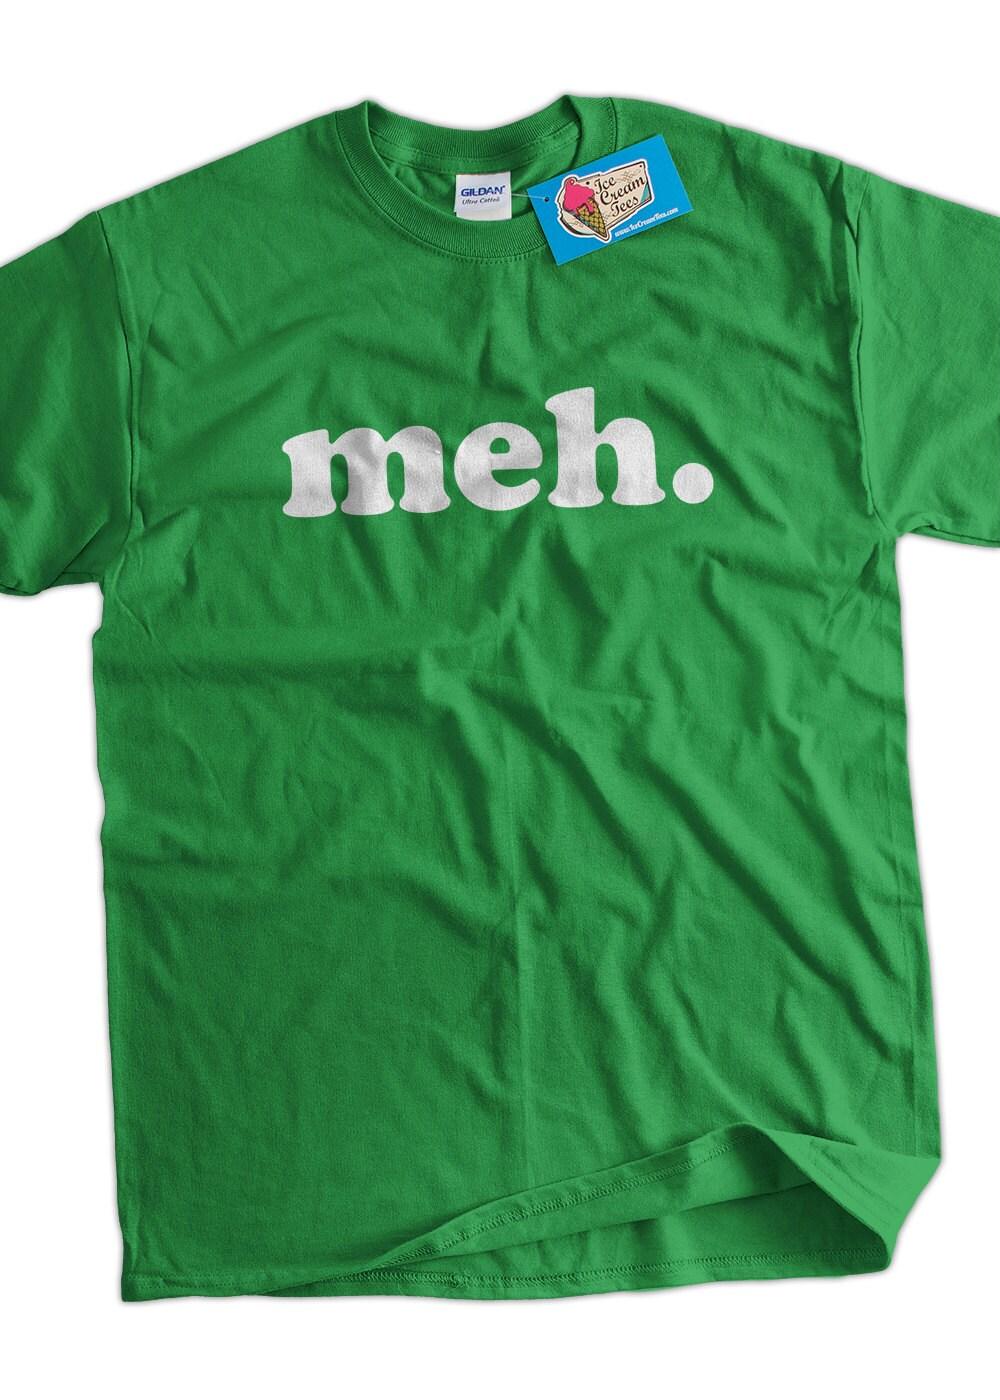 Meh Funny Tshirt Geek Nerd Cool Art Screen Printed T Shirt